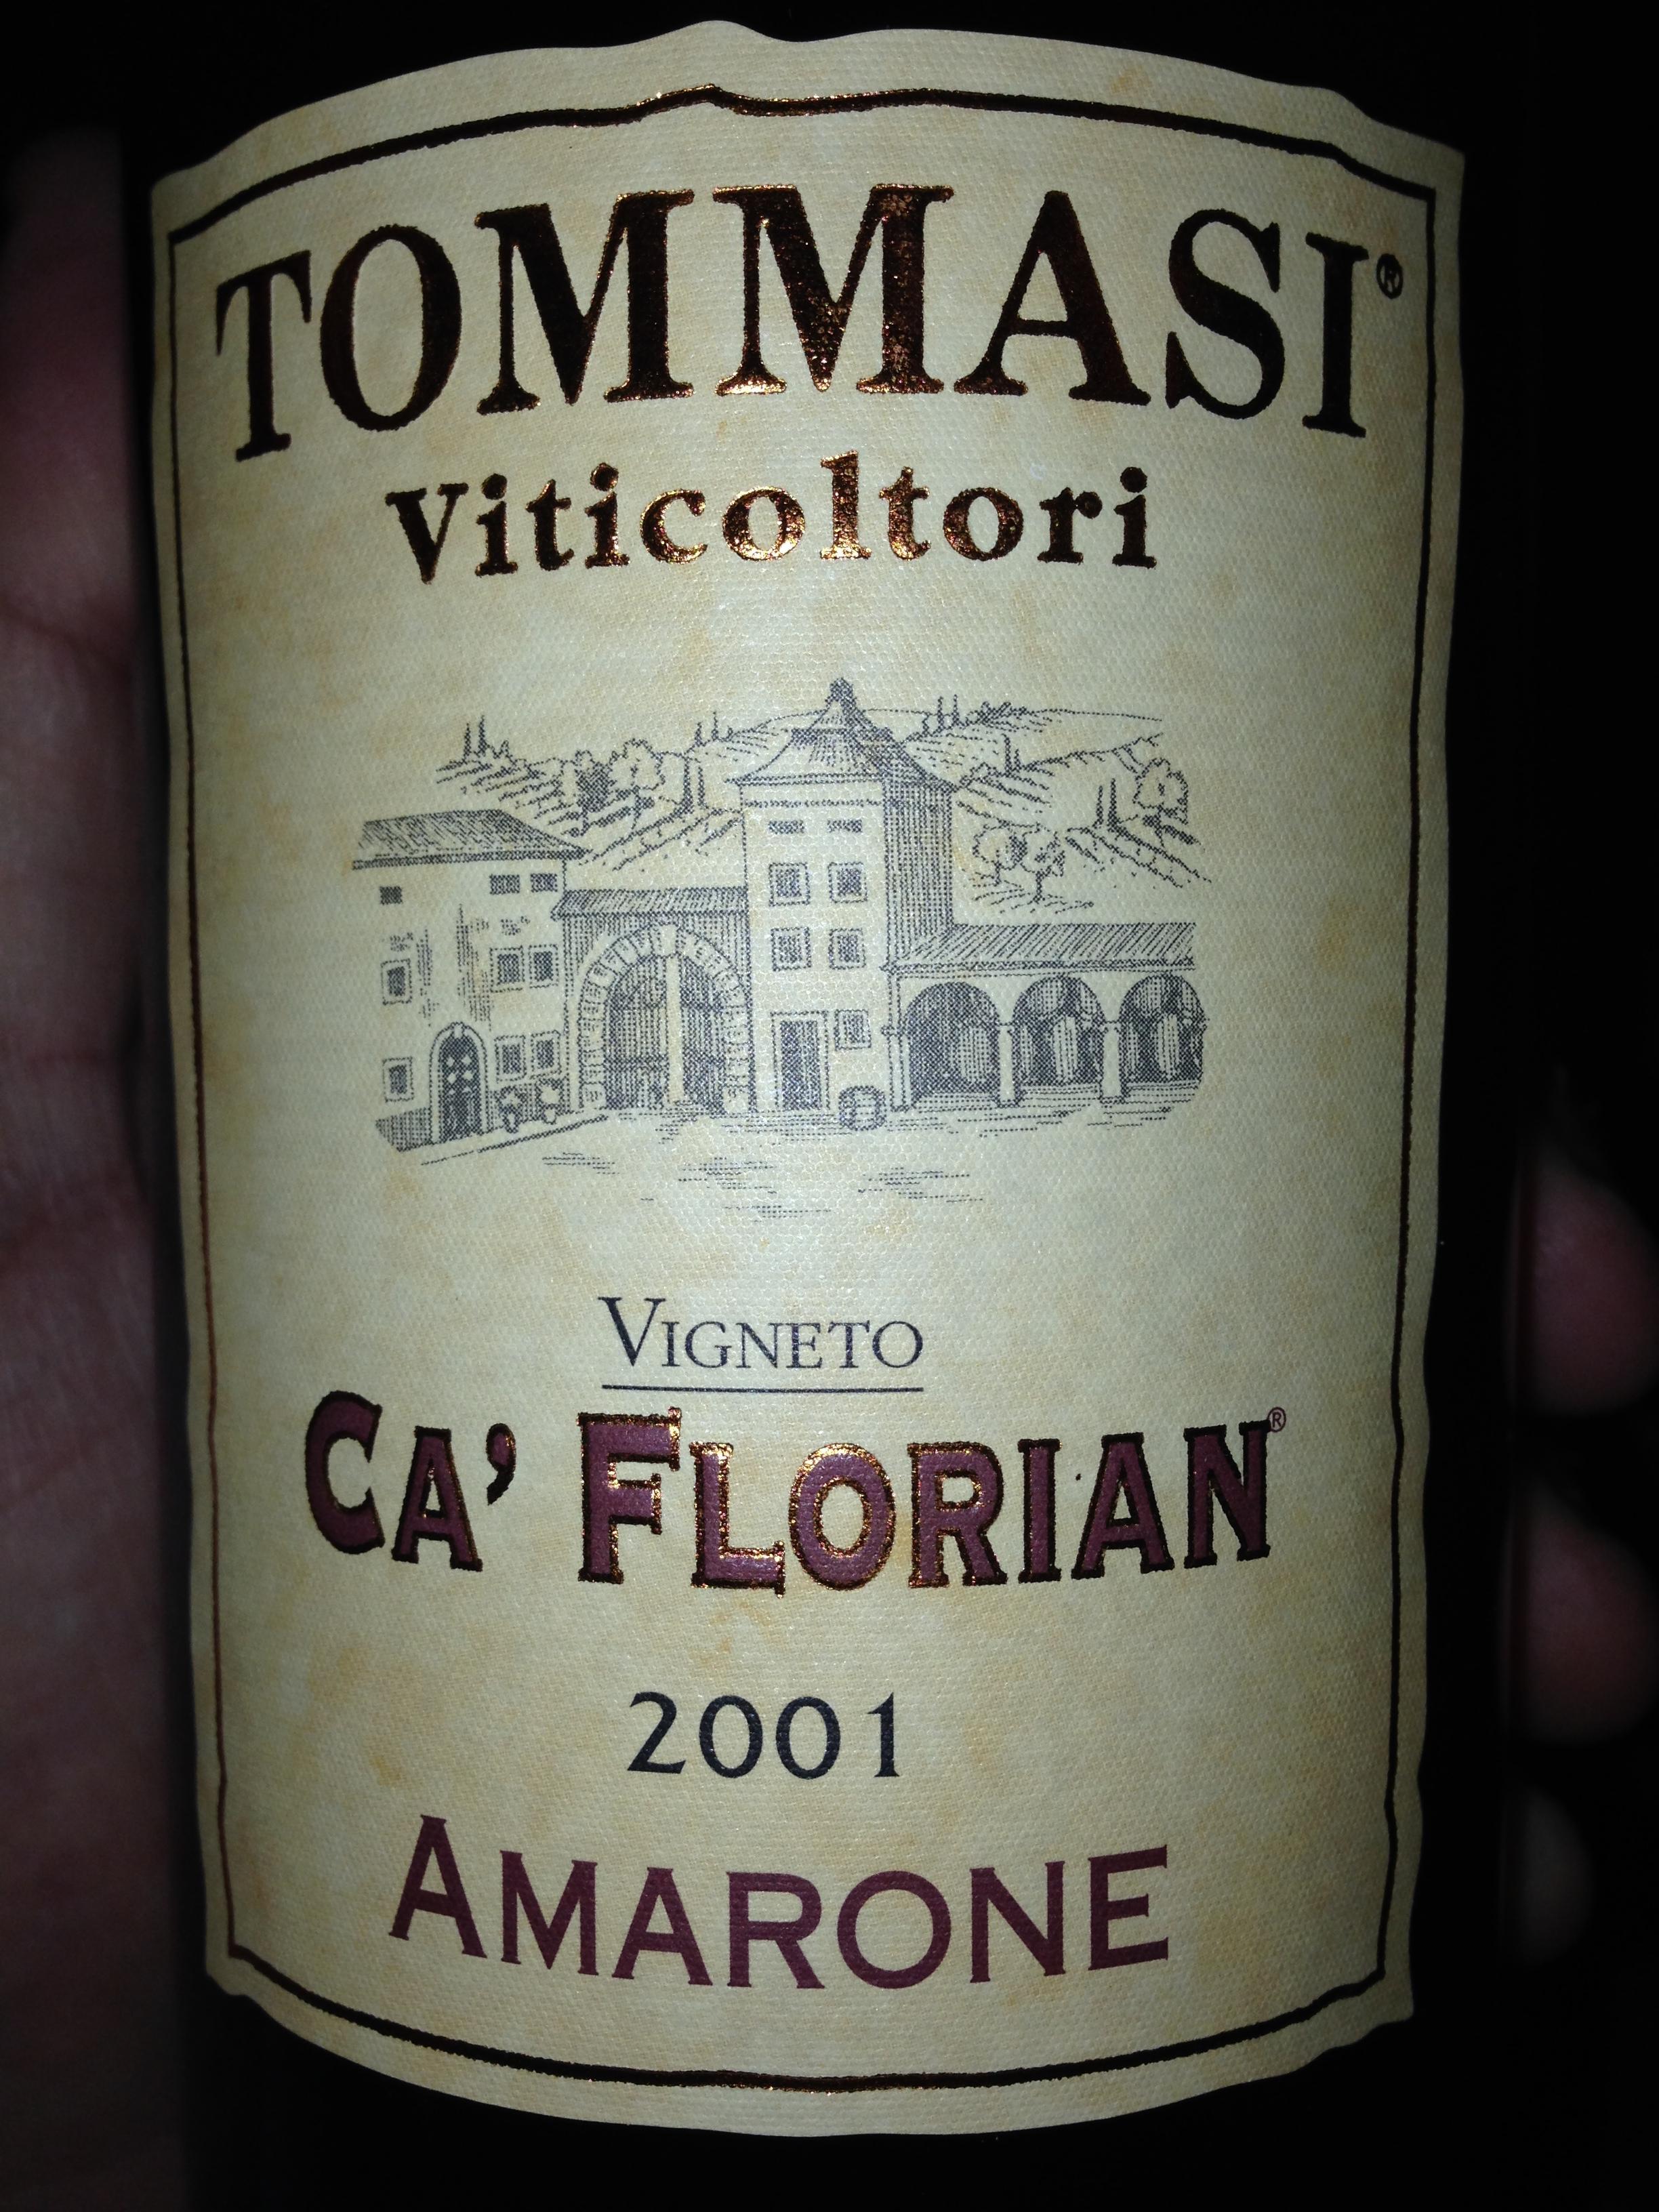 Tommasi Amarone Ca Florian 2001.JPG